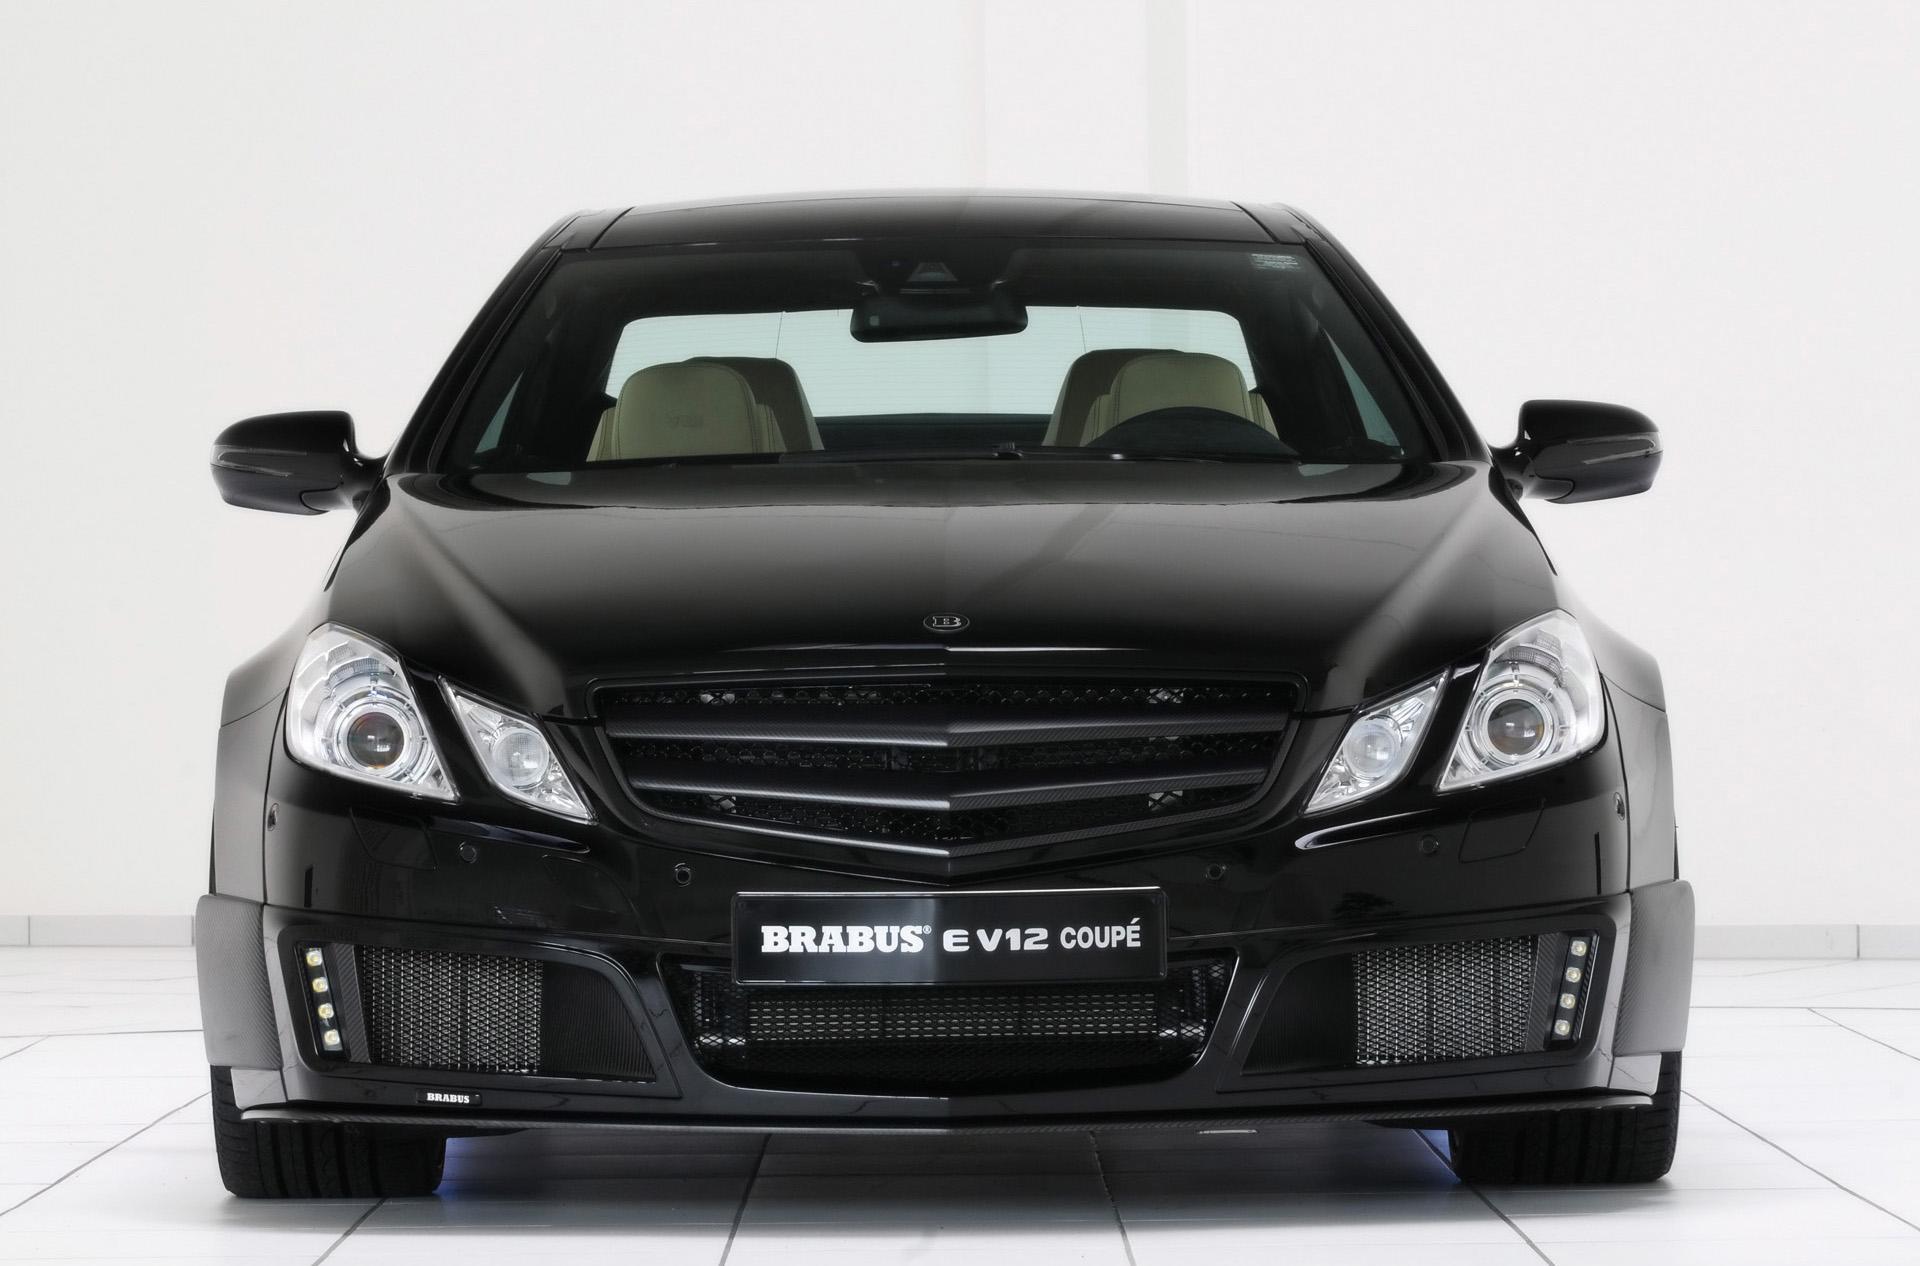 2010 brabus e v12 coupe. Black Bedroom Furniture Sets. Home Design Ideas